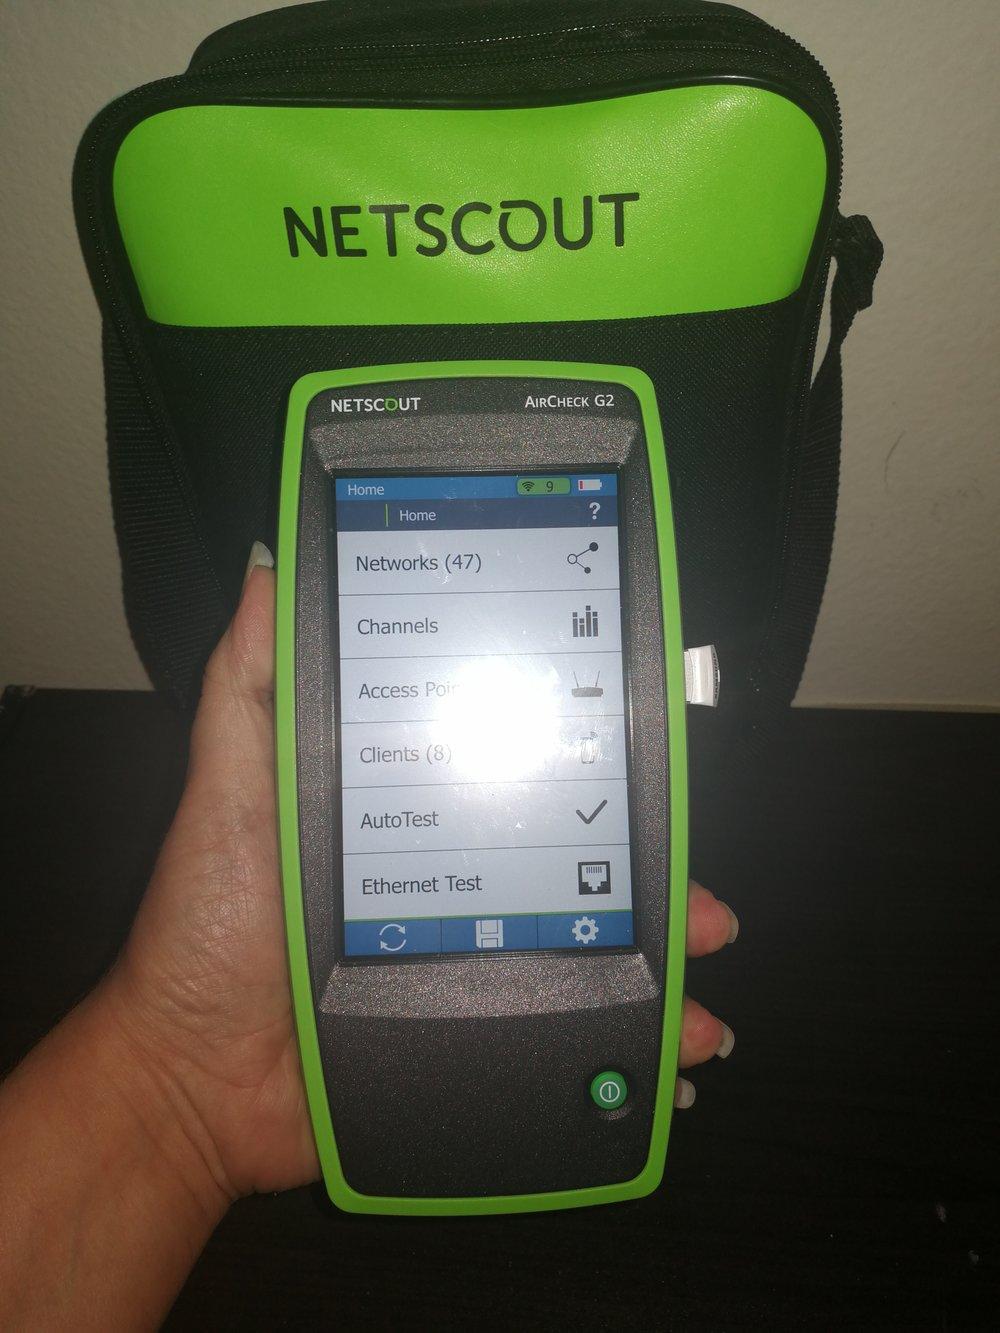 Netscout Aircheck G2 Homescreen